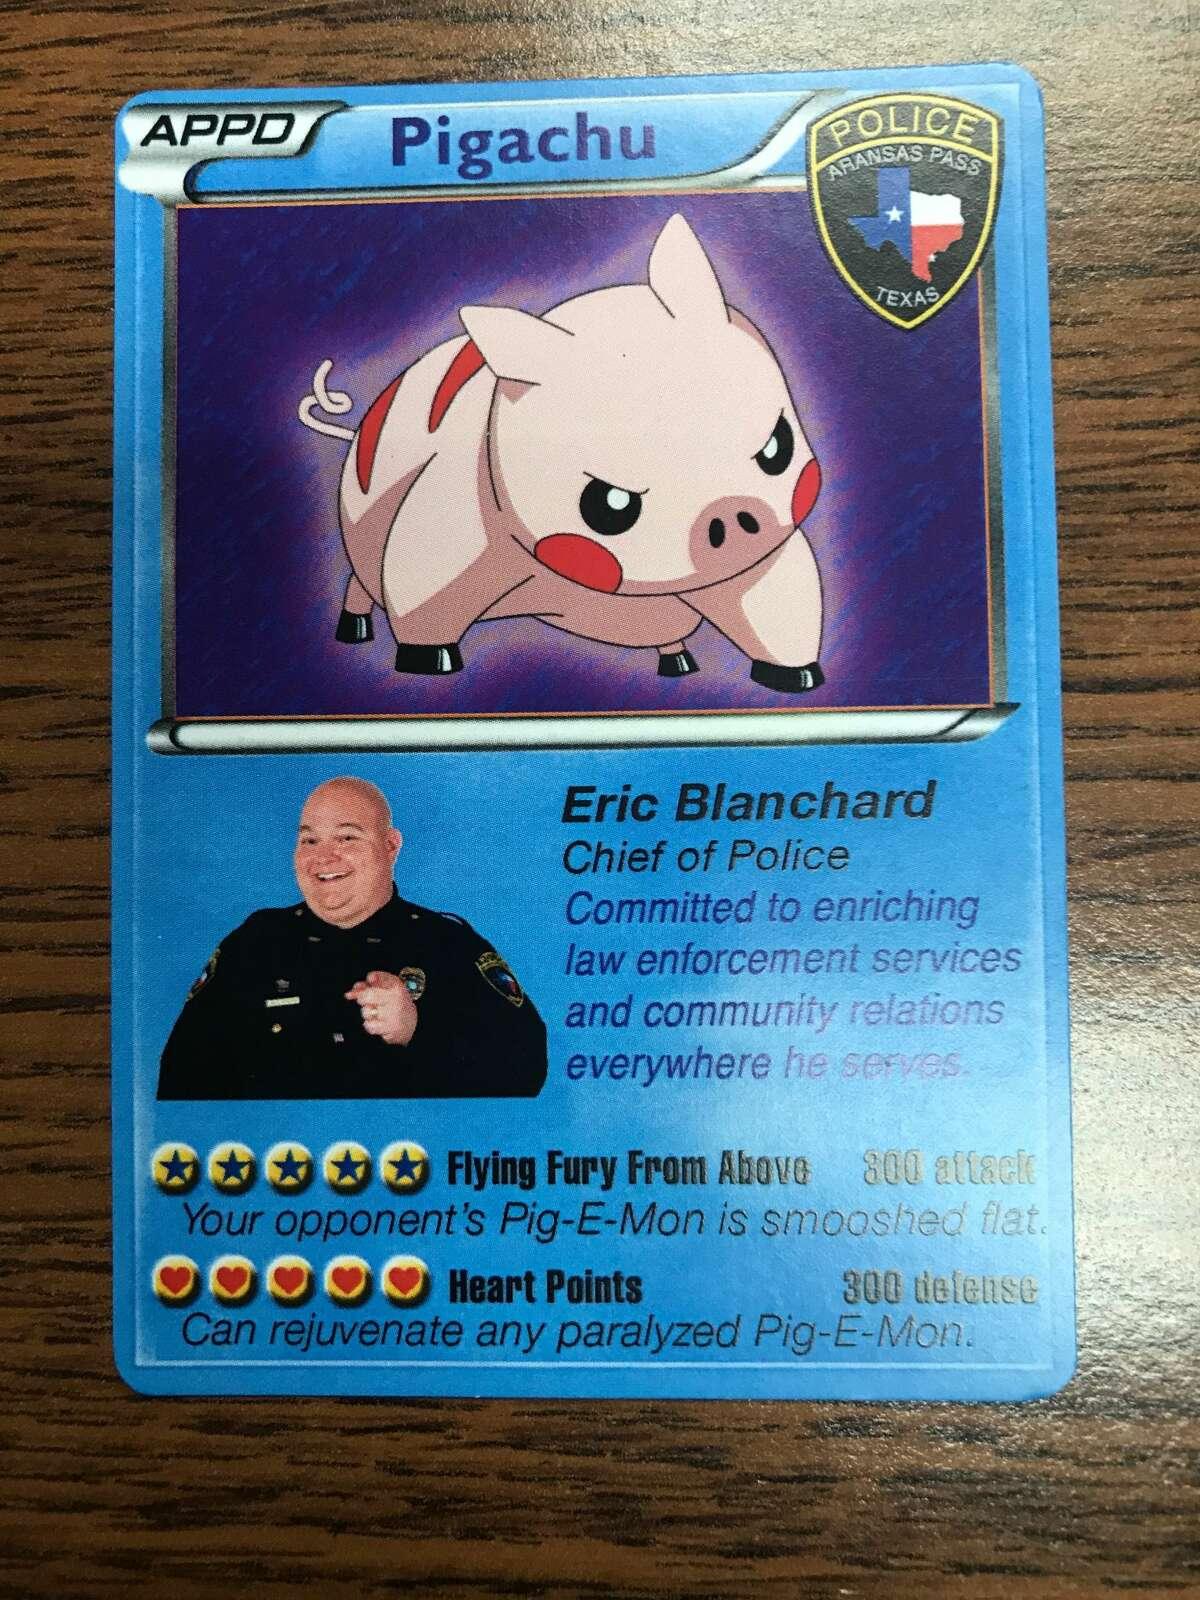 Pigachu is the Pig-E-Mon card for Aransas Pass Police Chief Eric Blancahard.